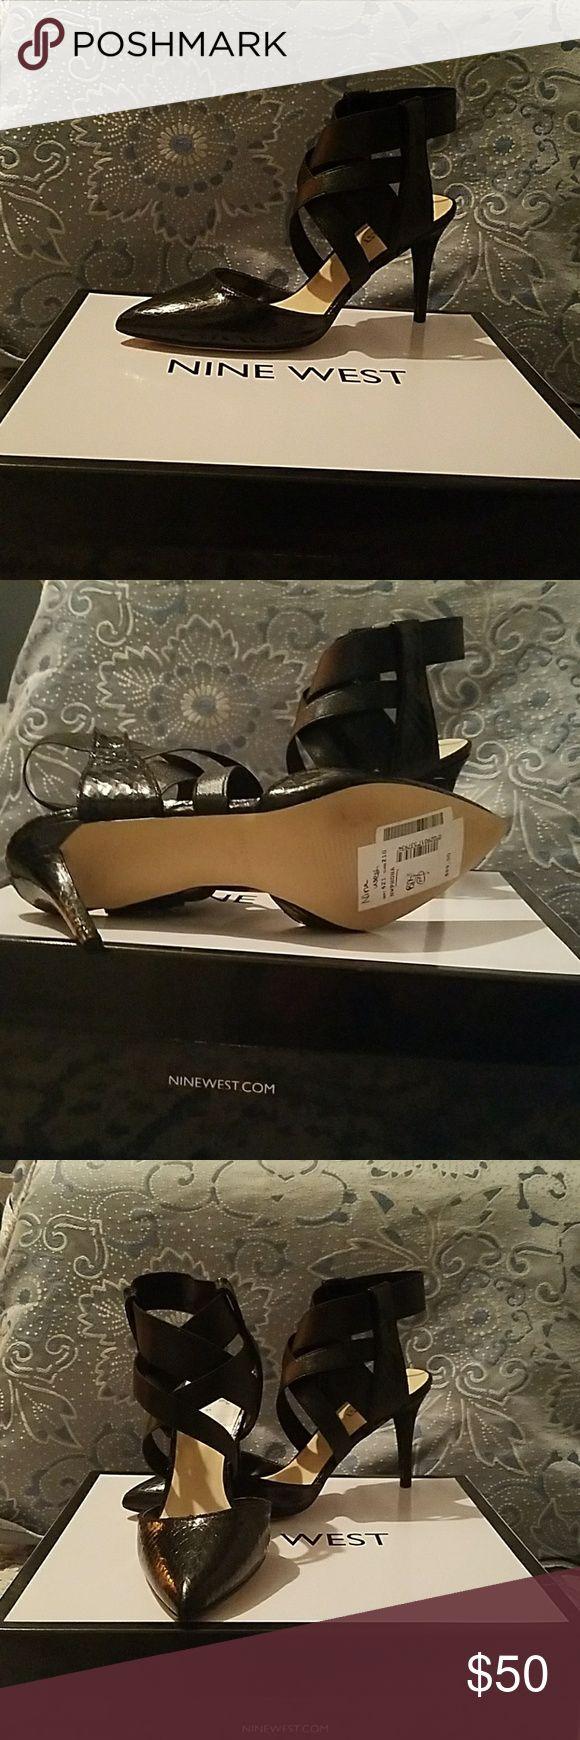 "Nine West High heels Shoes New never worn Nine West Black High heel 3"" Nine West Shoes Heels"